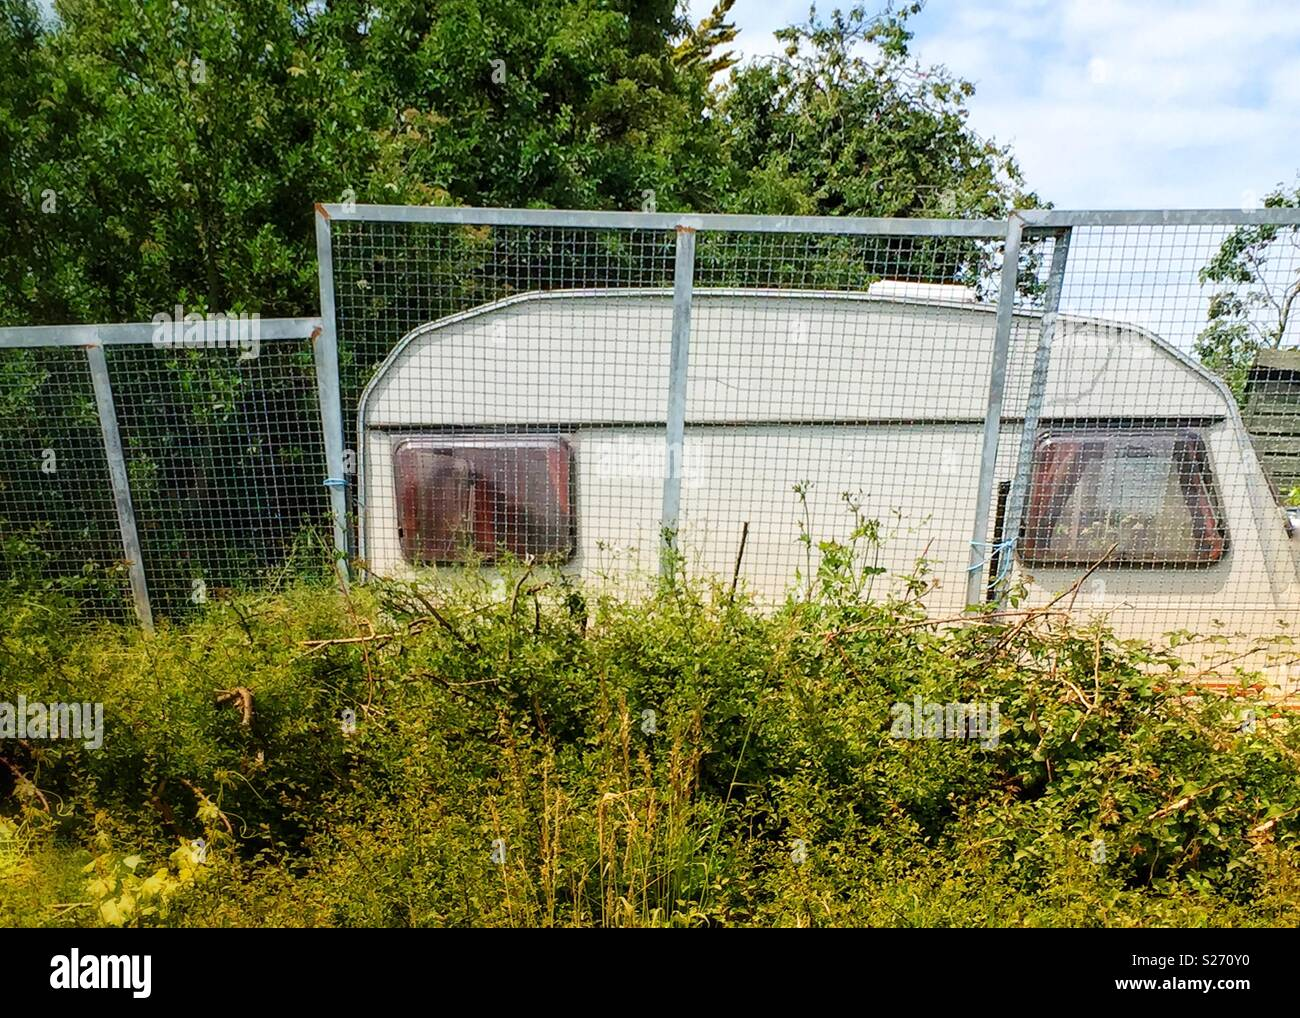 Caravan dumped in field - Stock Image